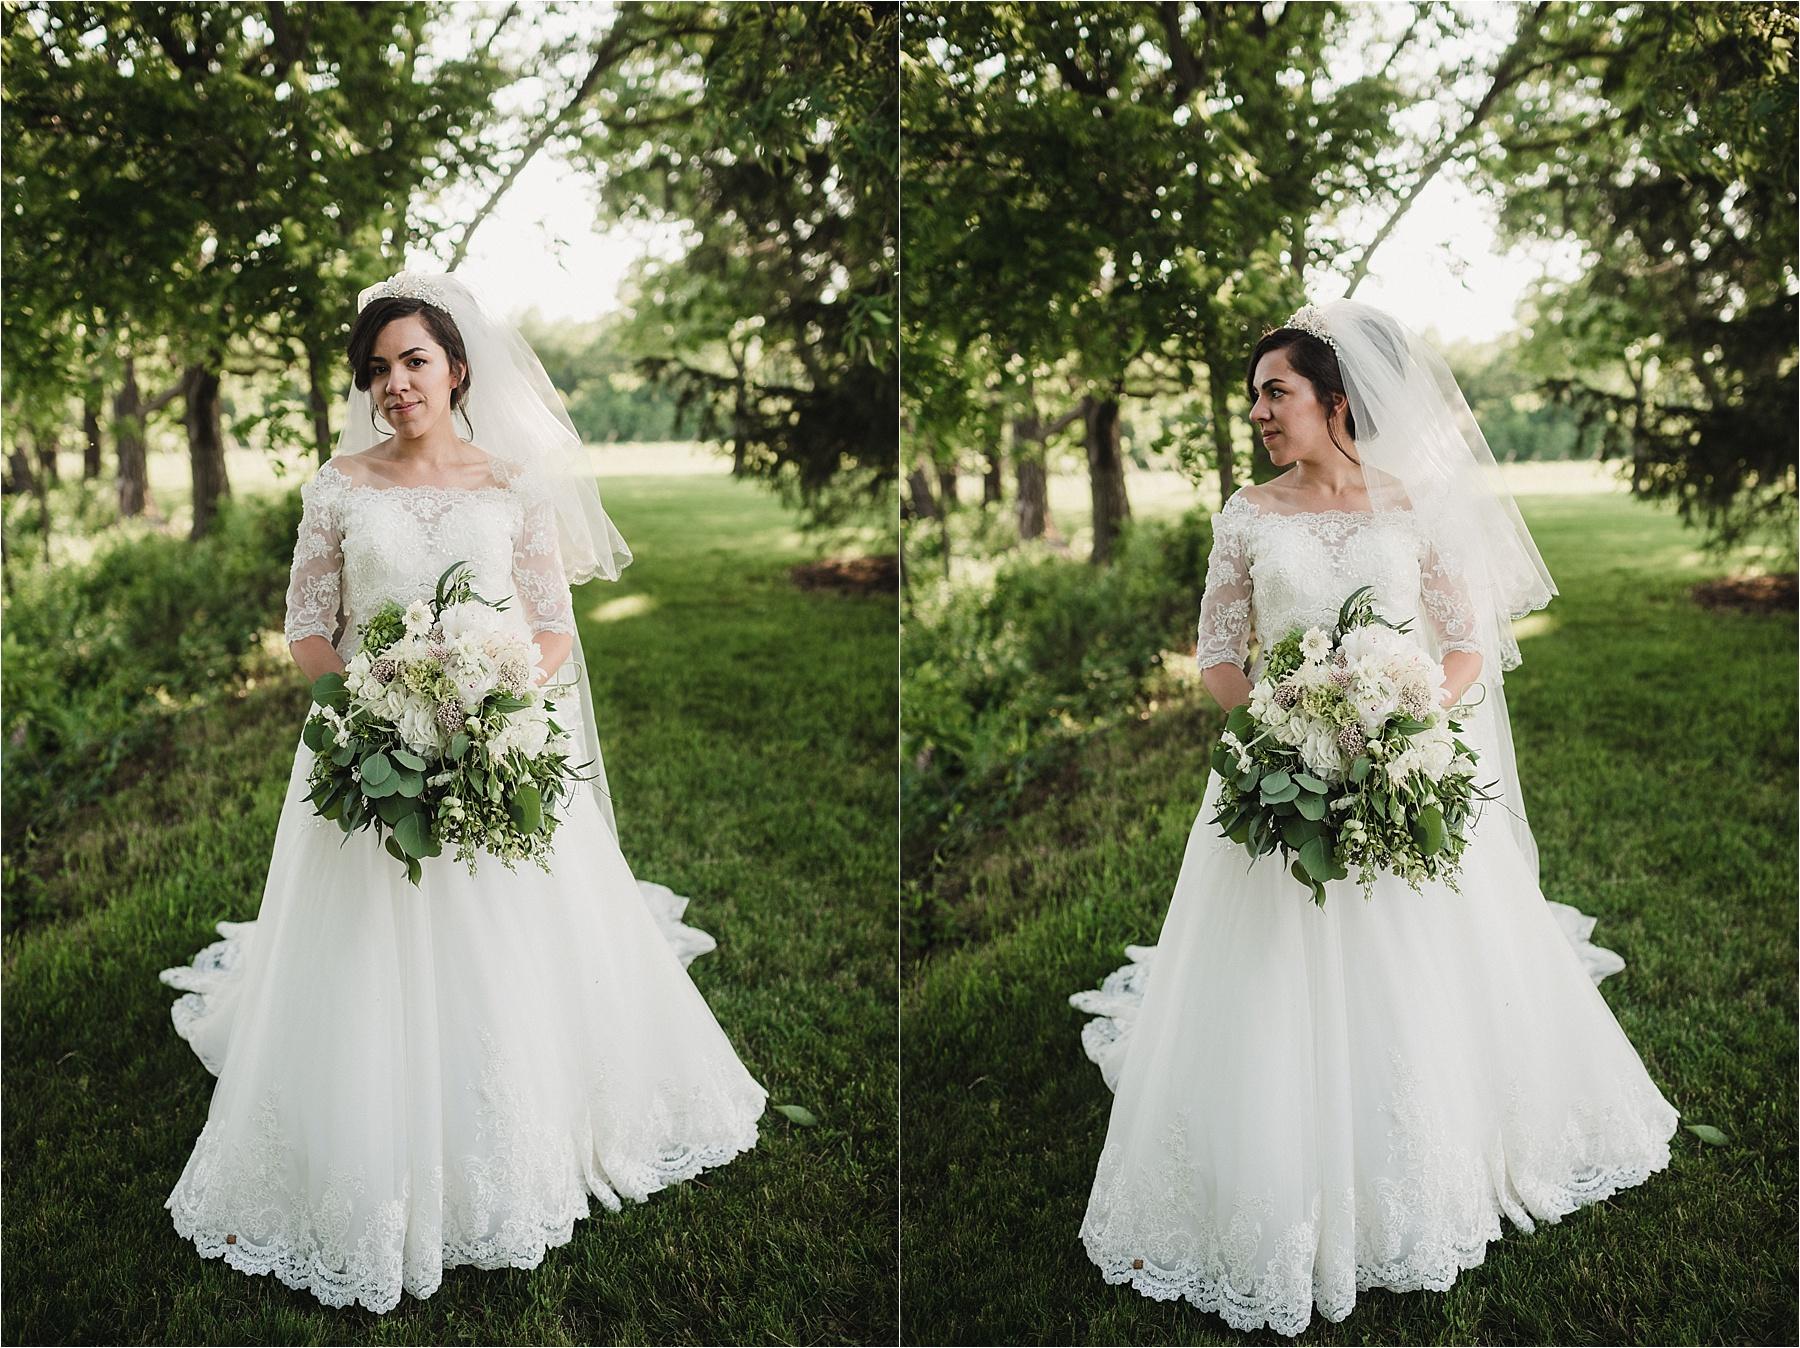 Bridal-92.jpg